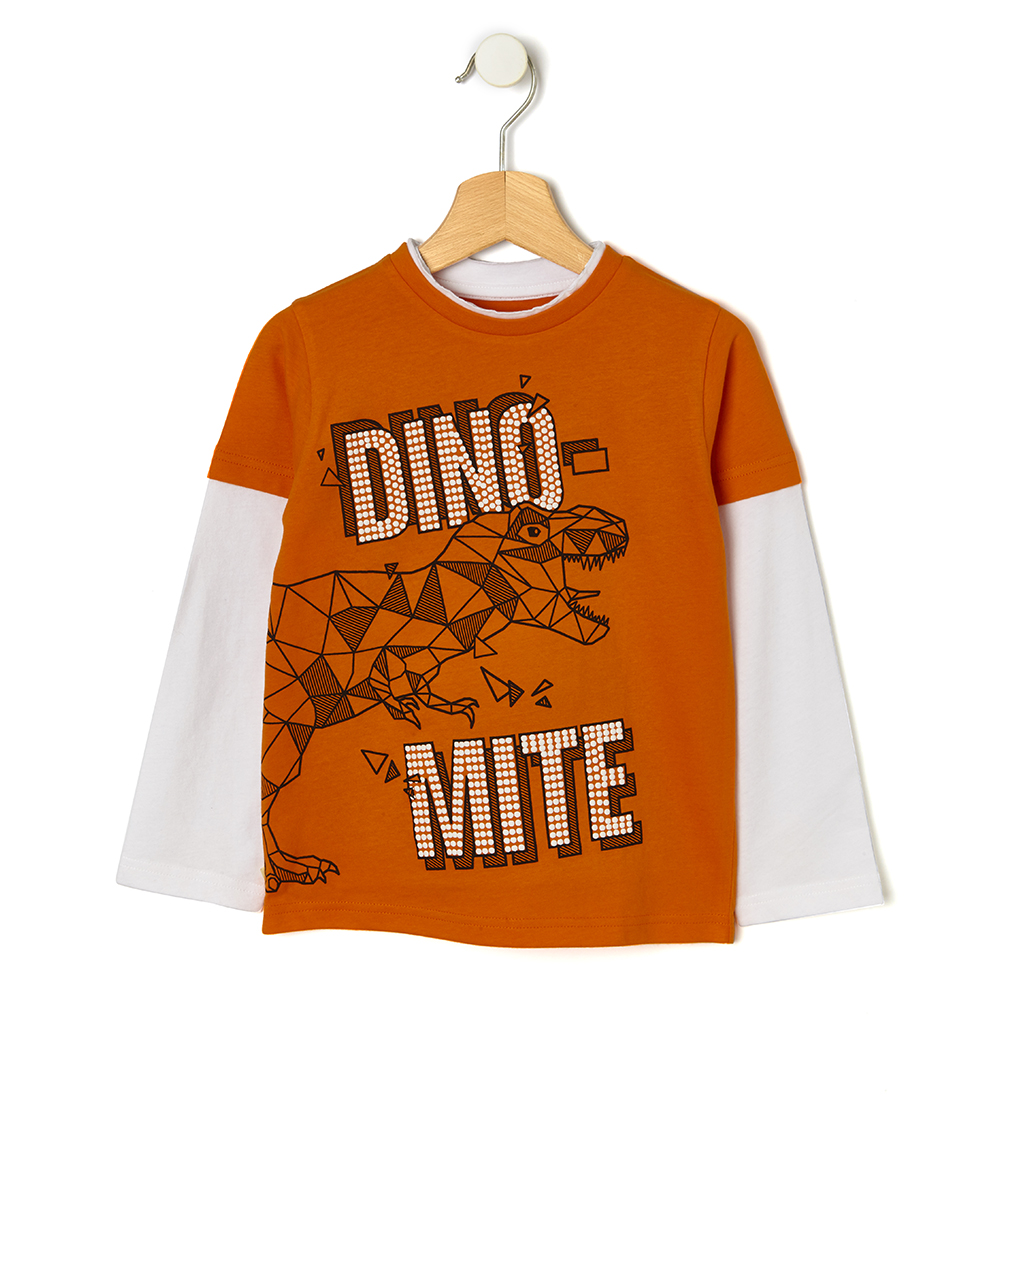 T-shirt Πορτοκαλί με Στάμπα Μεγ.8-9/9-10 ετών για Αγόρι